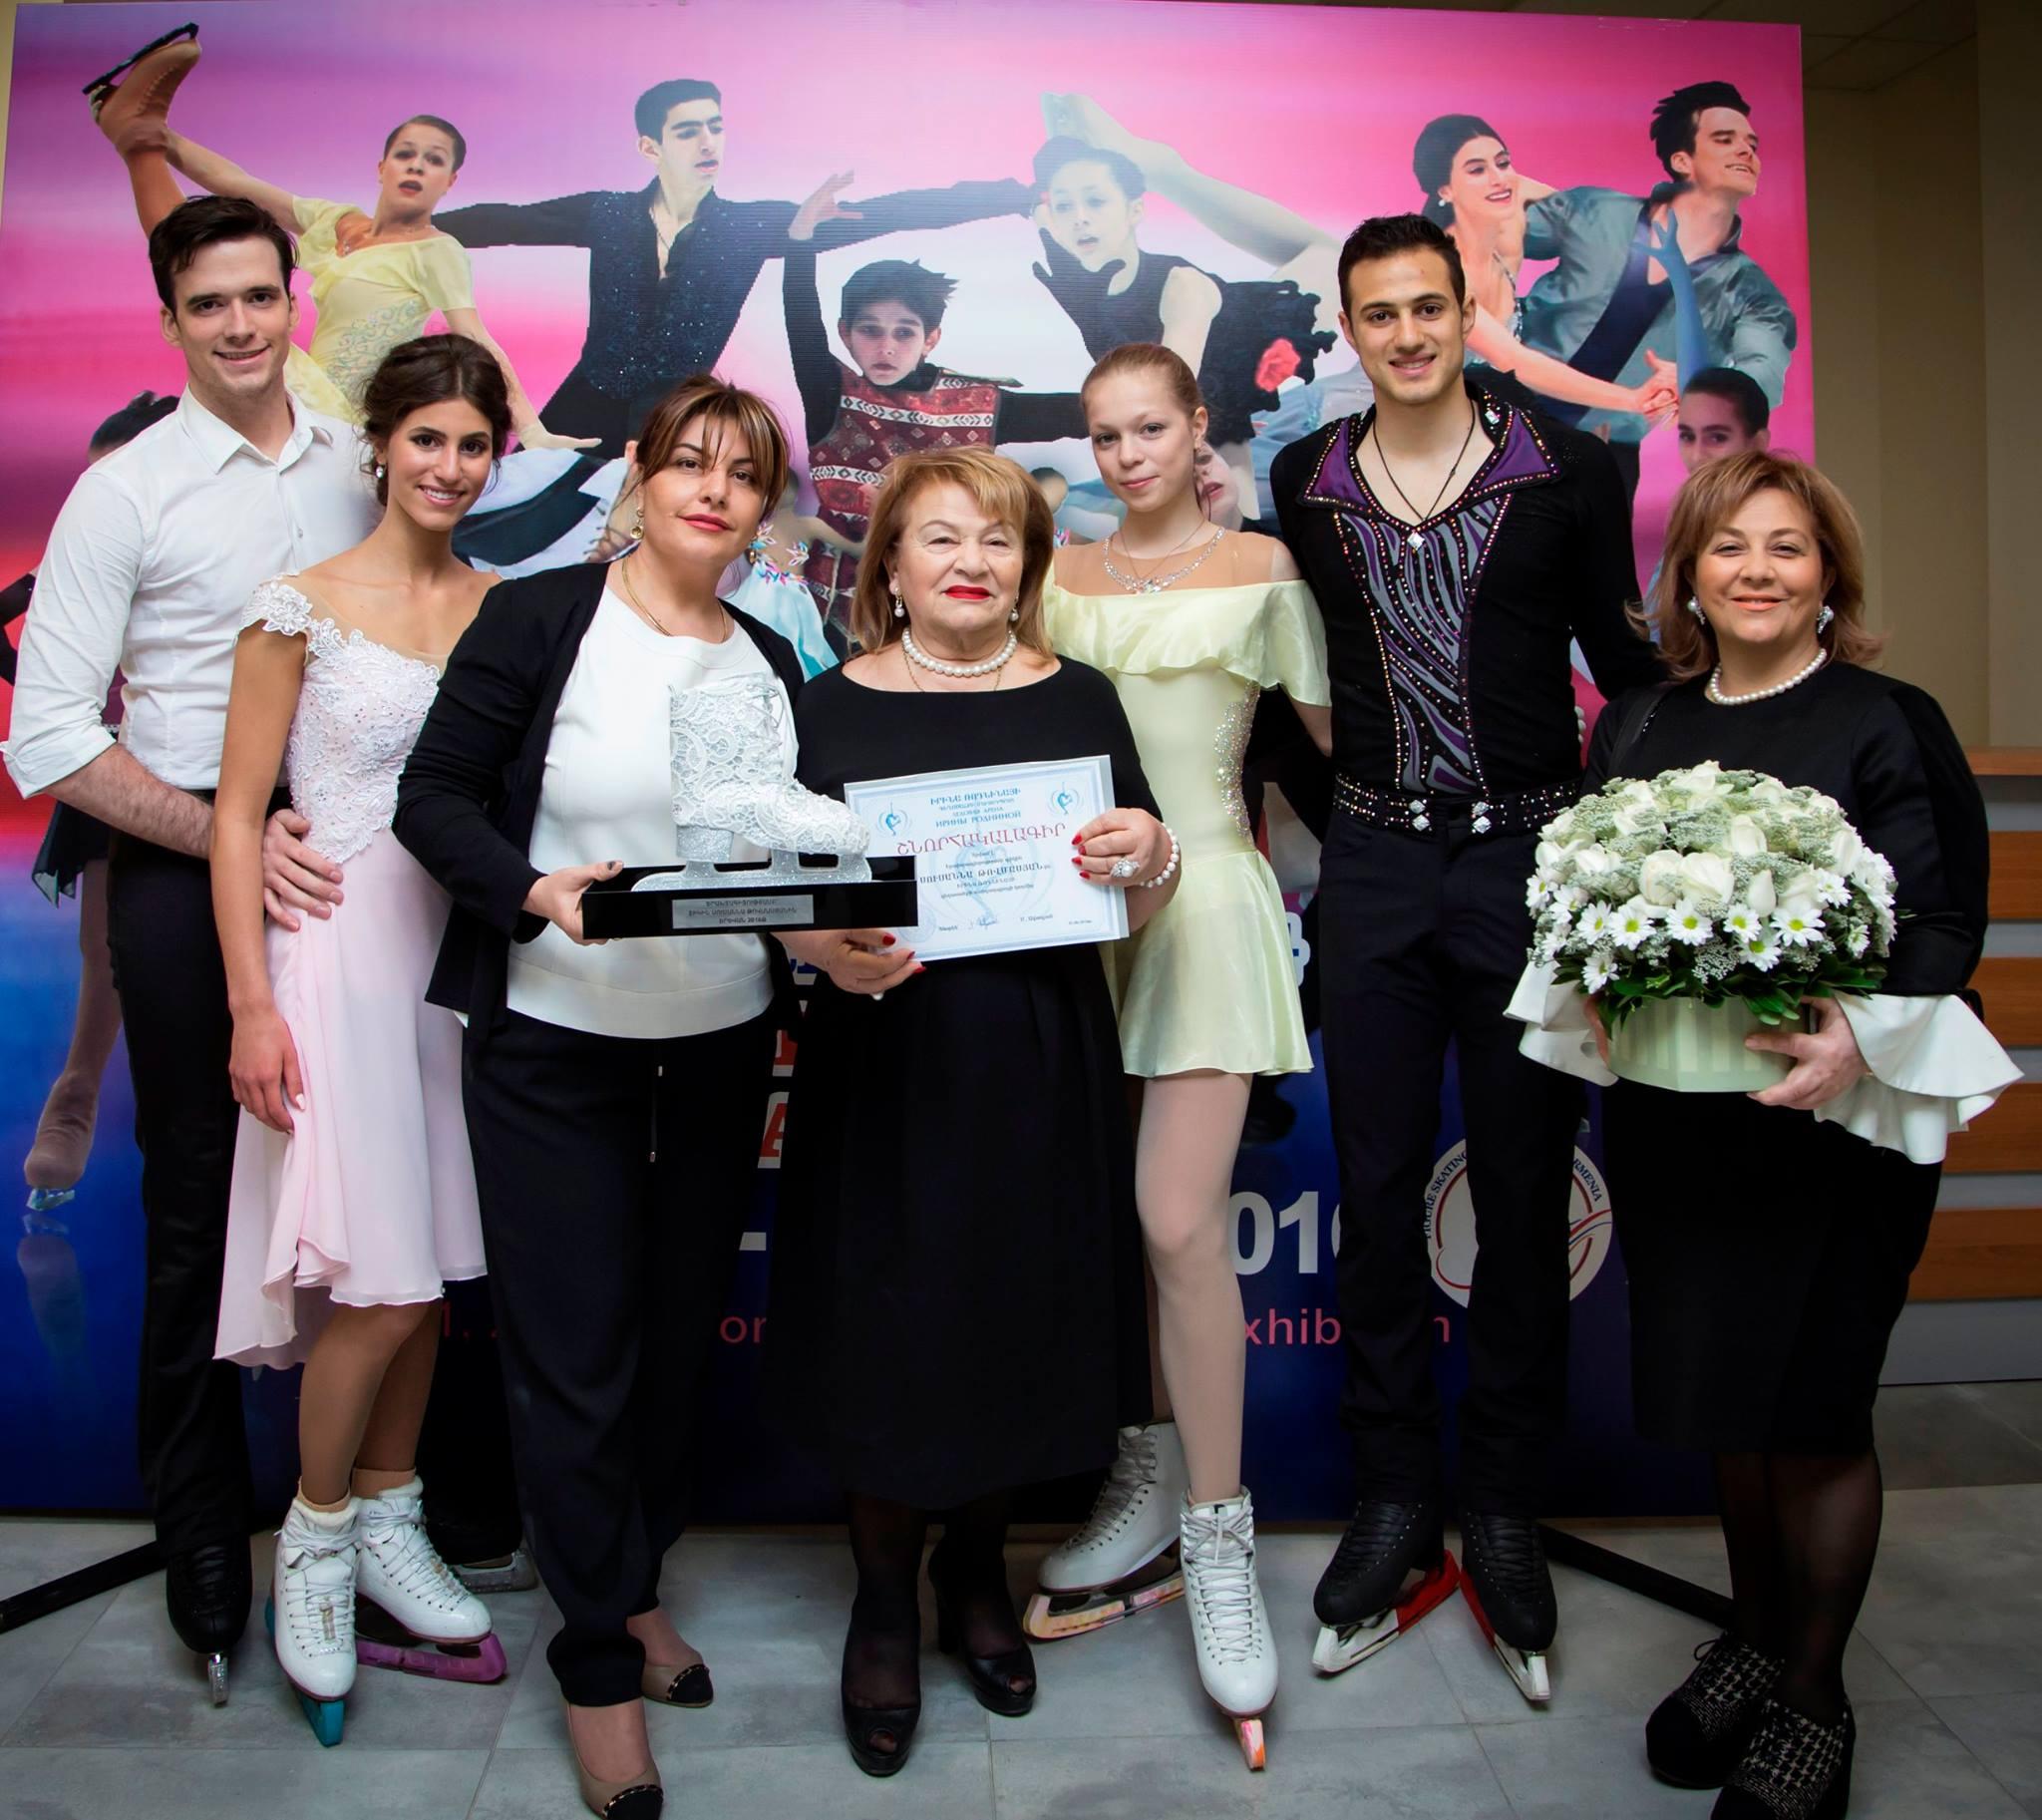 """Tovmasyan"" foundation donated 140 pairs of skates to Irina Rodnina's figure-skating school cover"